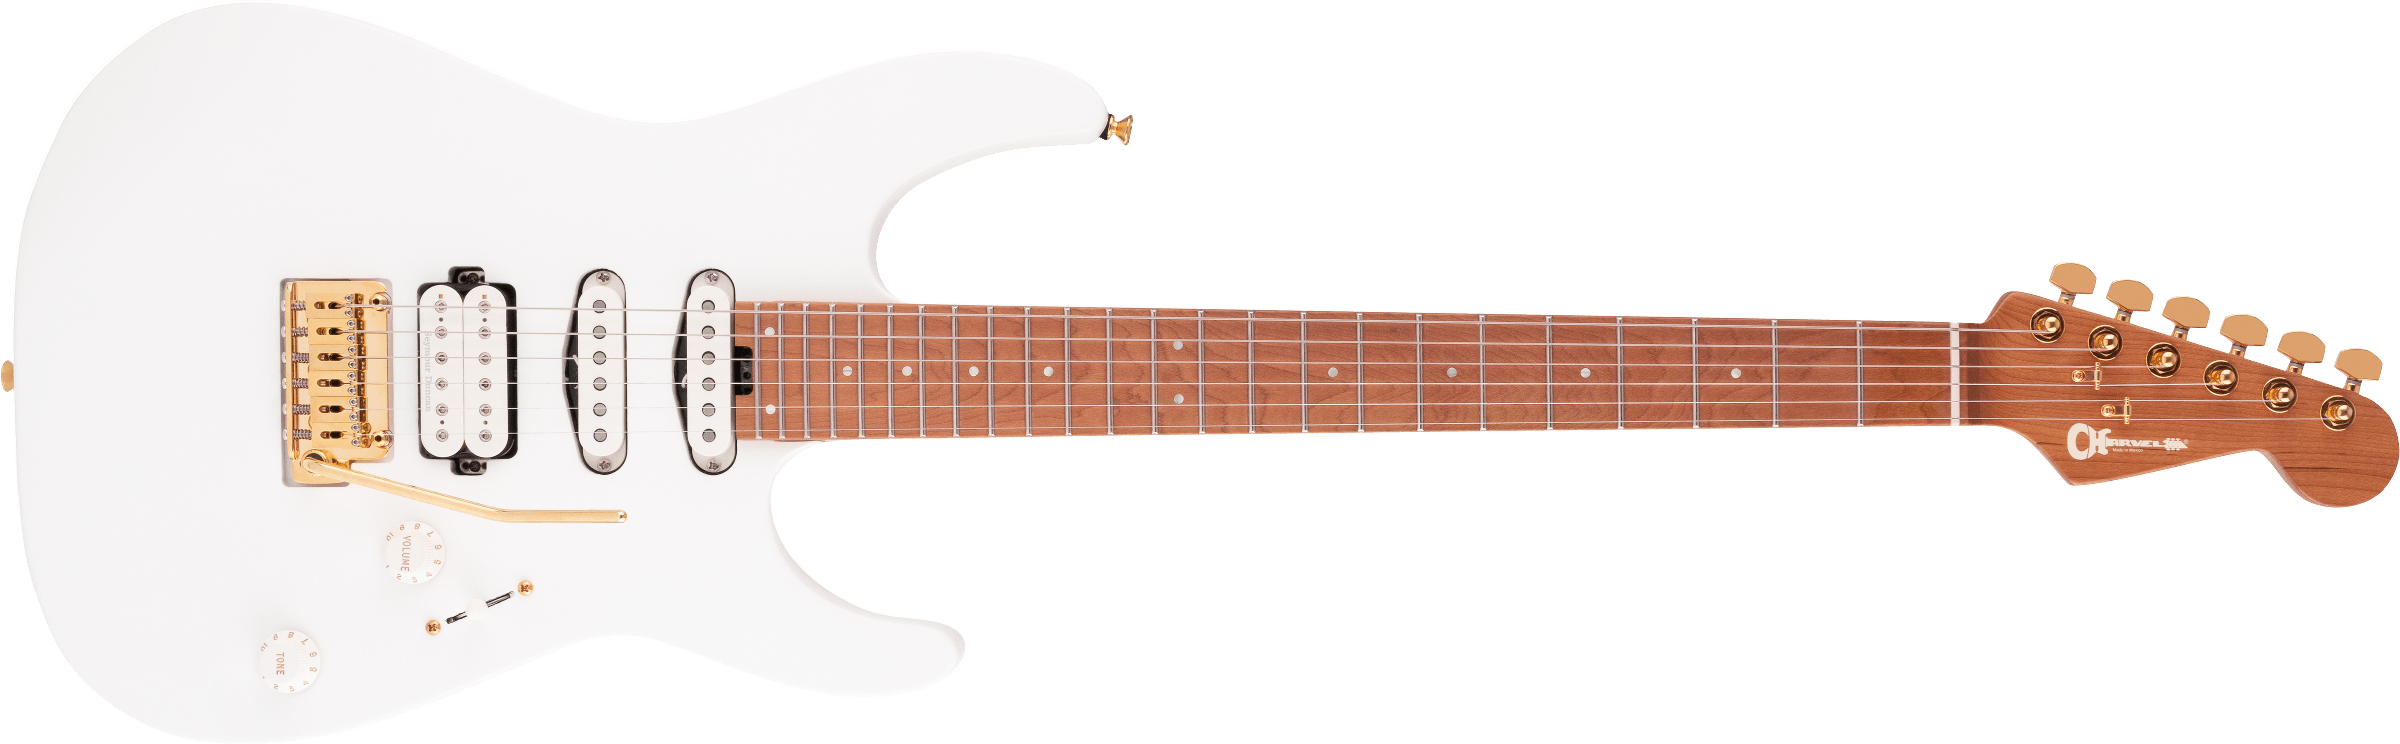 Charvel Pro-Mod DK24 HSS 2PT CM, Caramelized Maple Fingerboard, Snow White